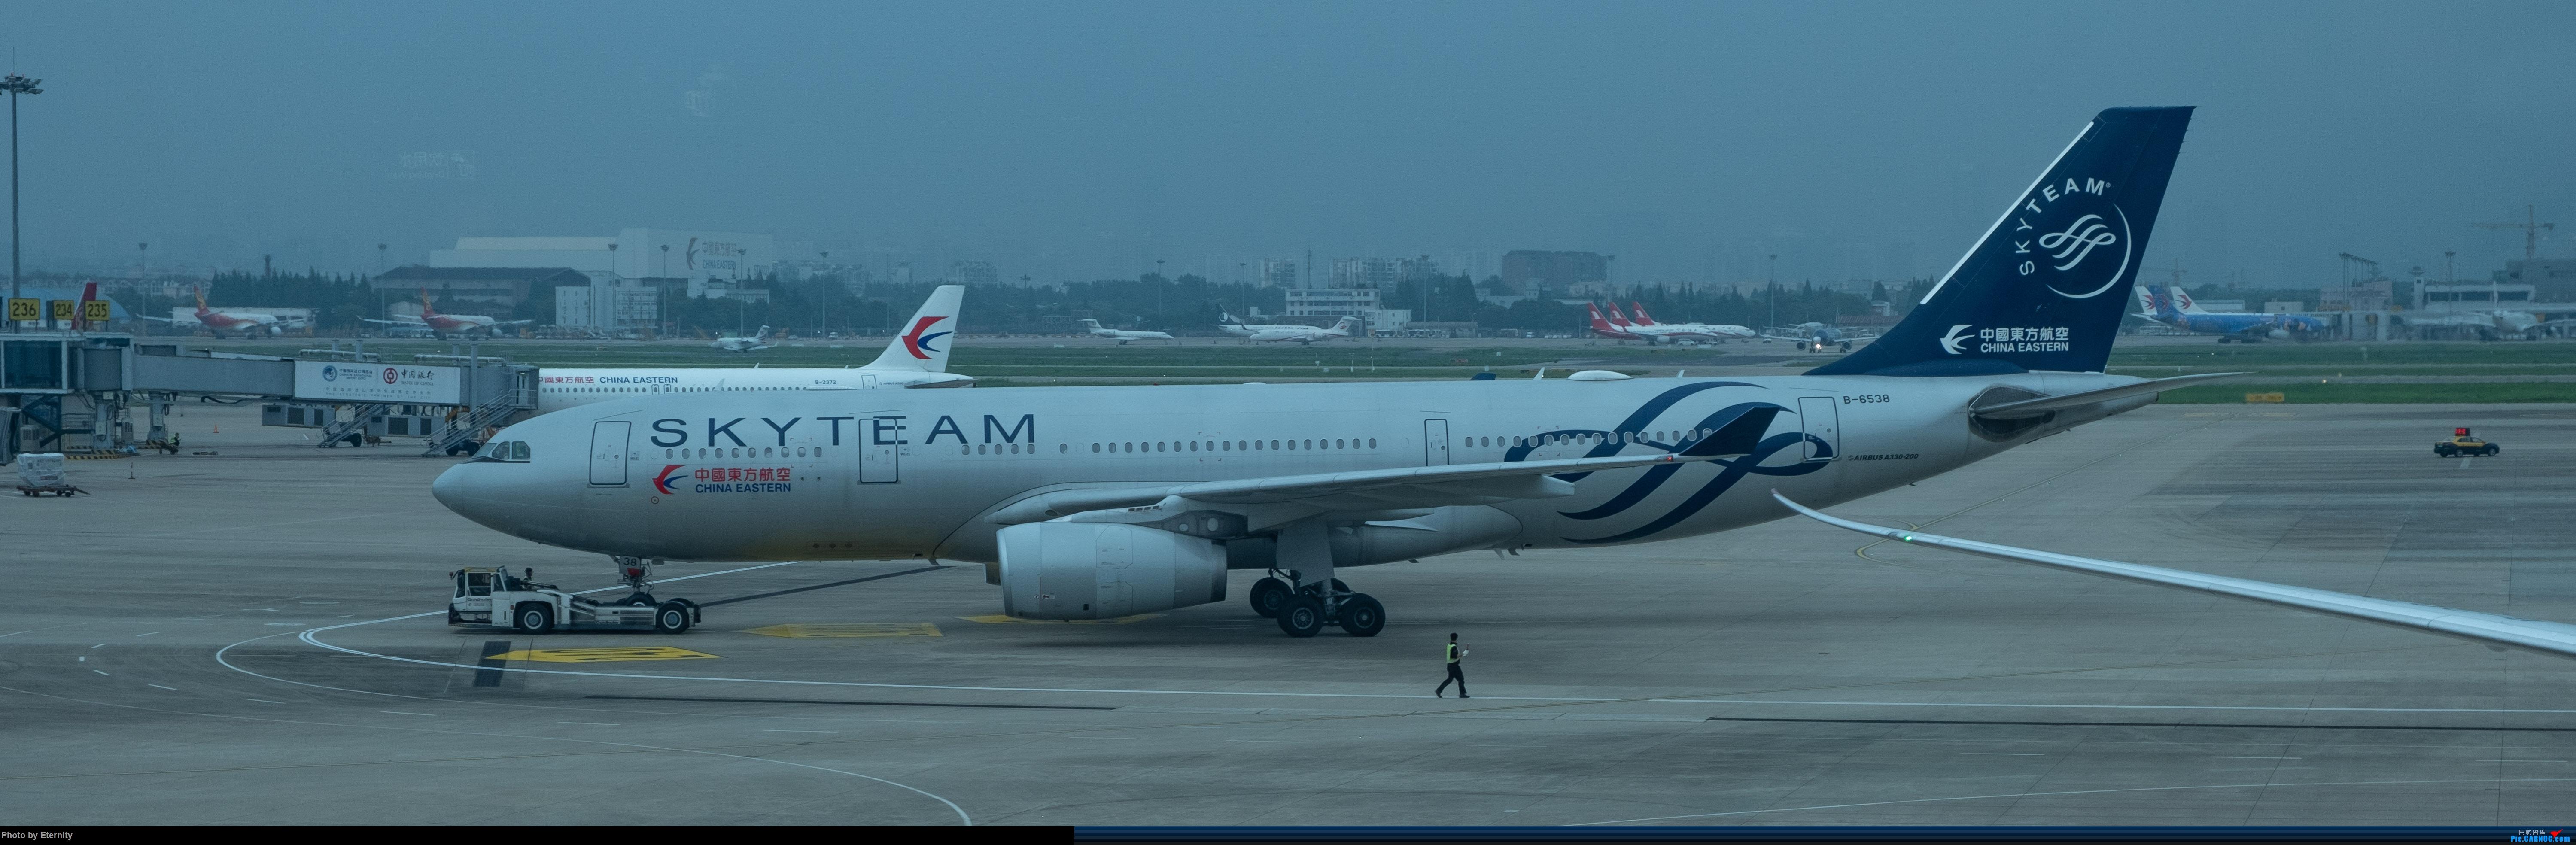 Re:[原创]后疫情期间的暑假国内游 | 西安-上海-广州-成都 | 体验国内3条干线 | 吉祥航空787 | 南航350 | 海航737 AIRBUS A330-200 B-6538 中国上海虹桥国际机场